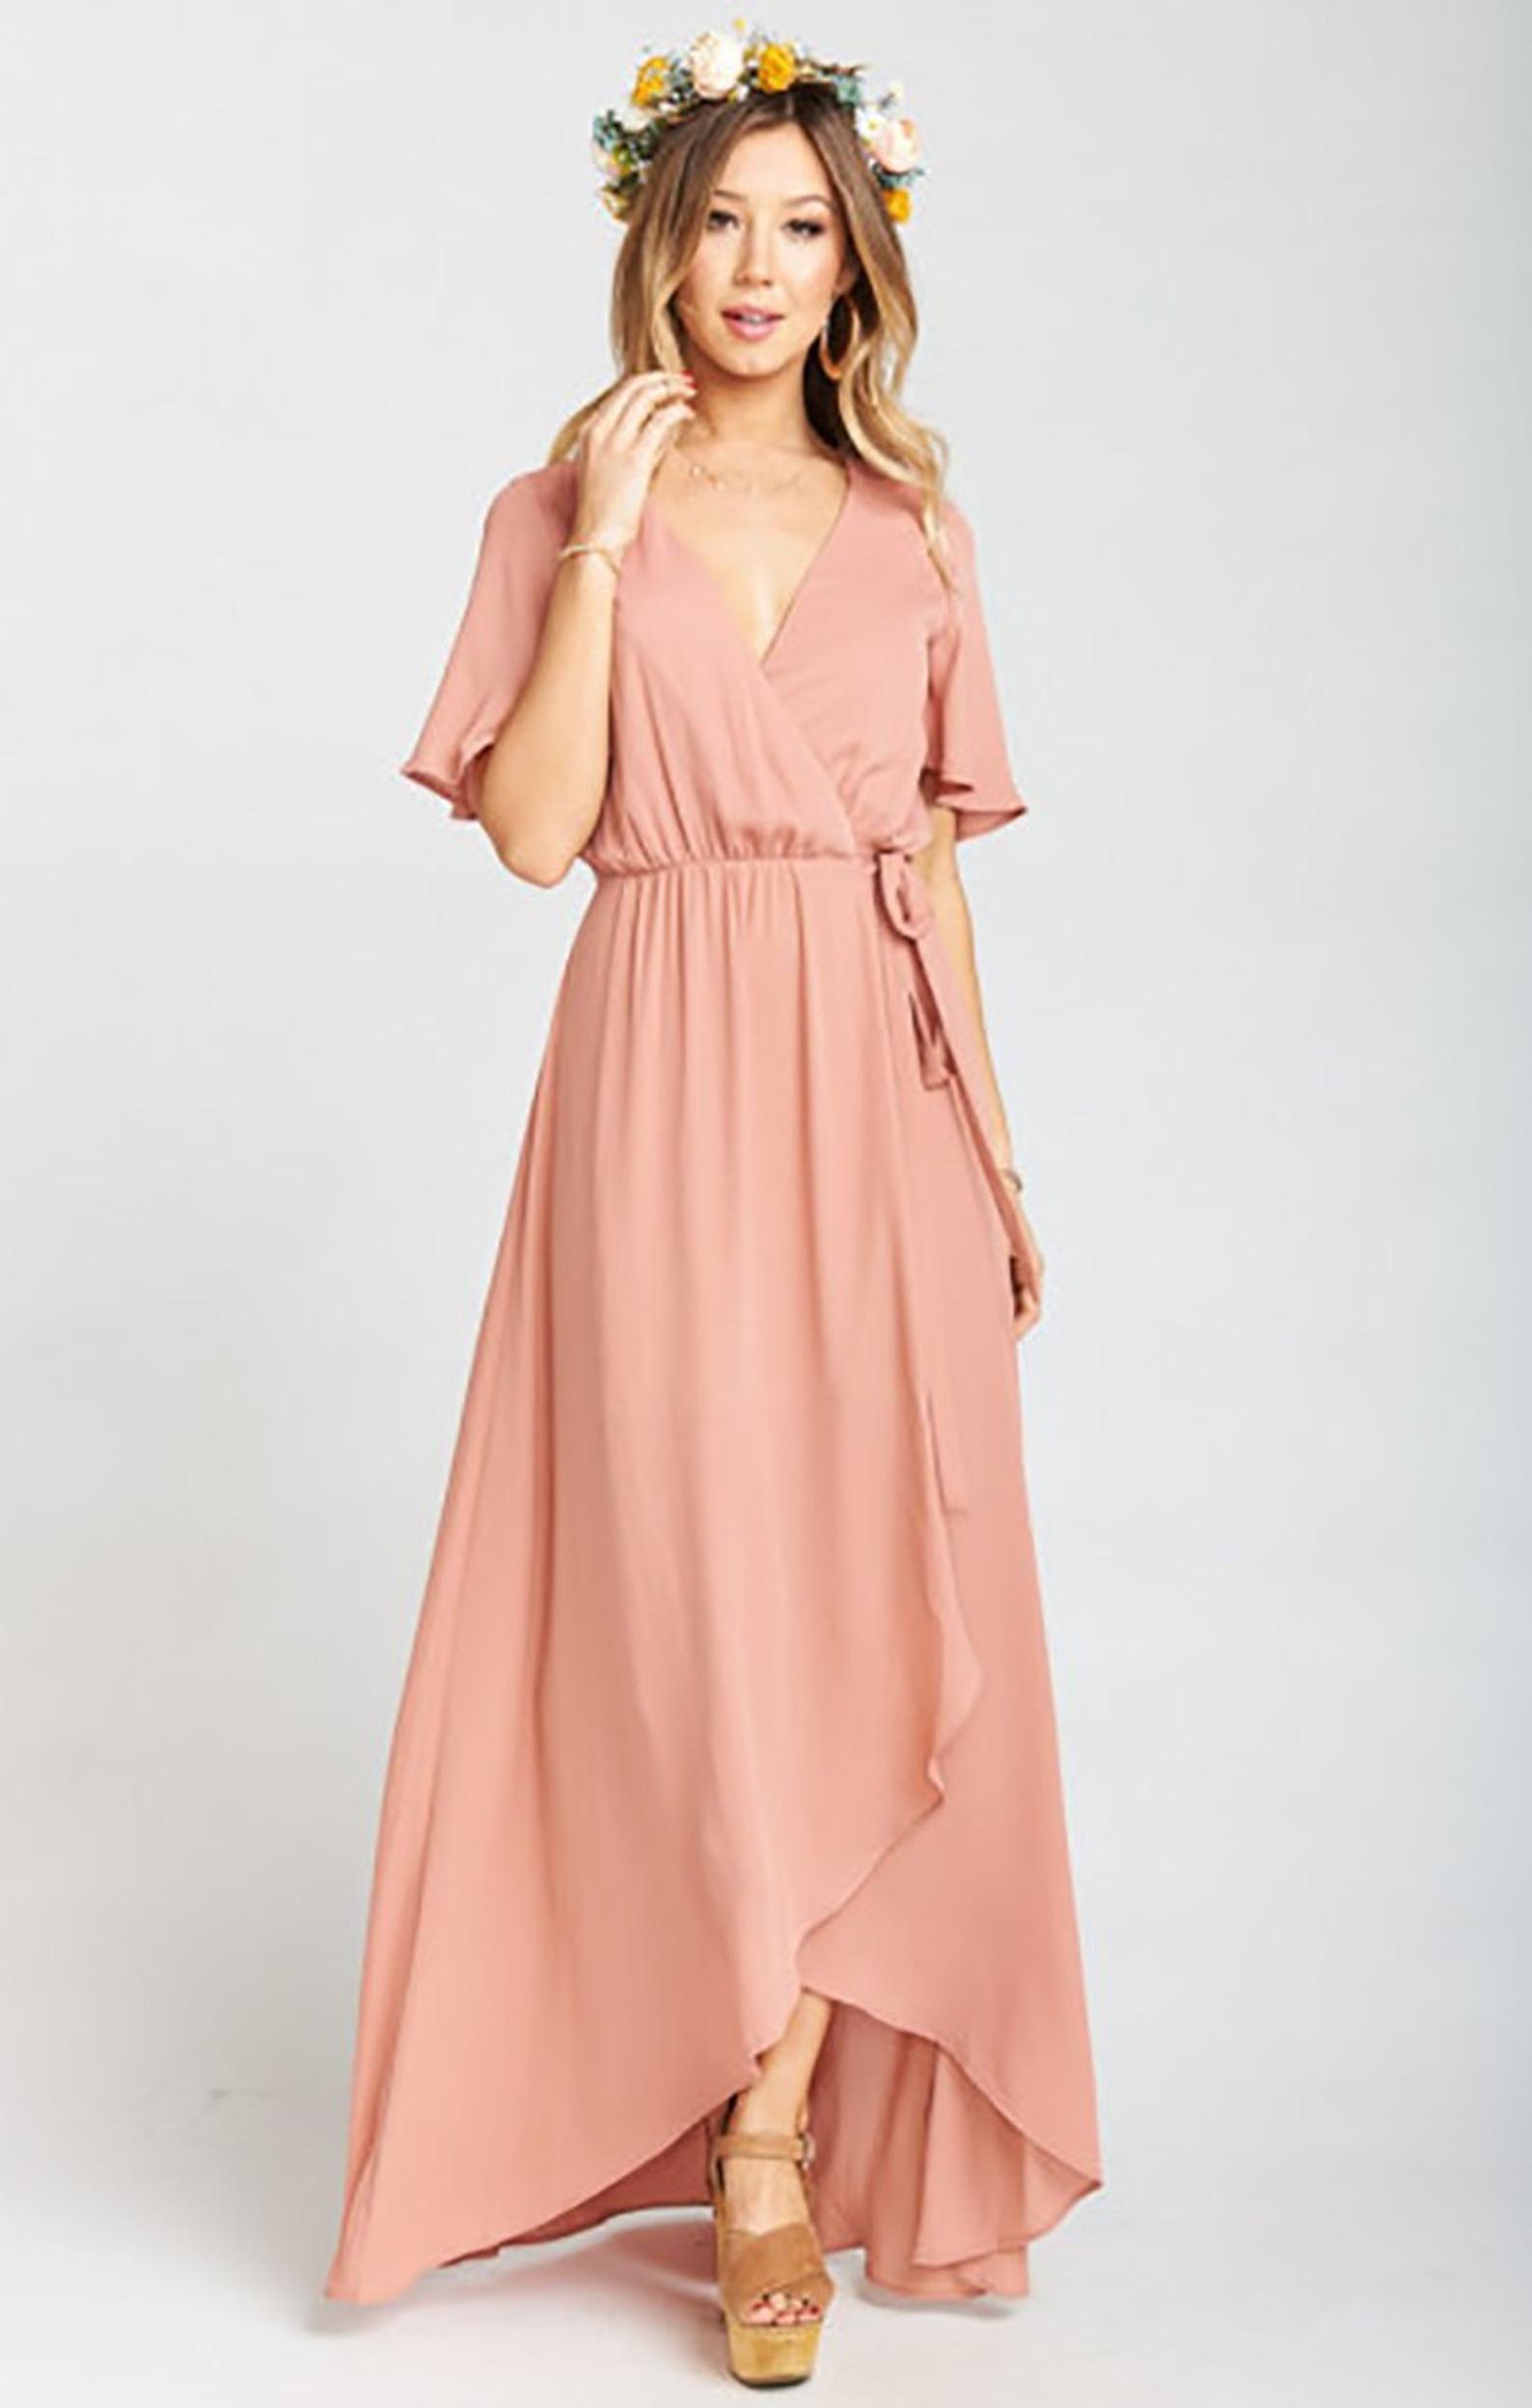 Bridesmaids Dresses,Wrap Dresses,Peach Bridesmaids Dresses